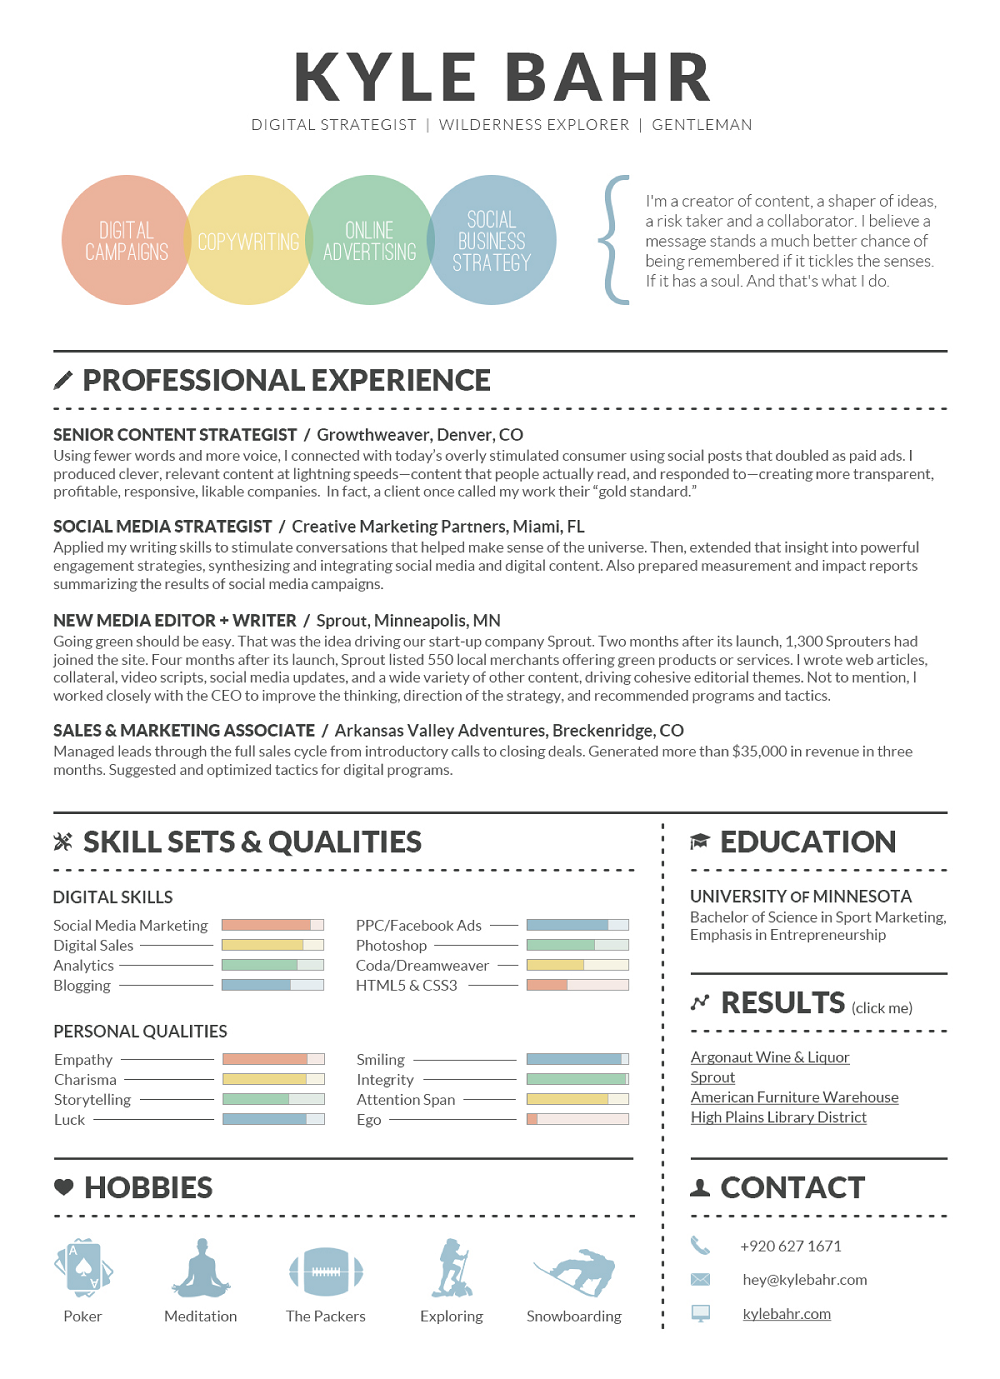 Digital Strategist Infographic Resume- Kyle Bahr #visualresume ...